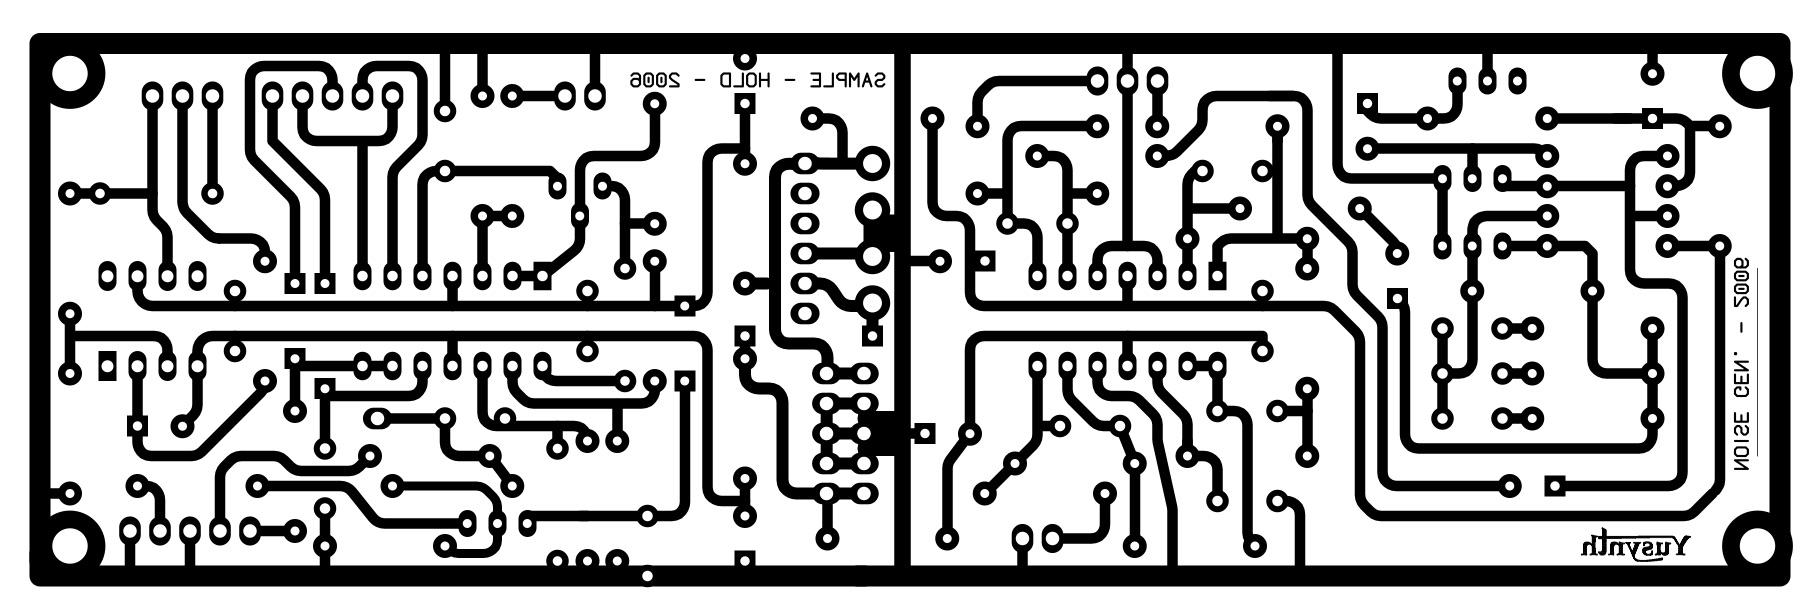 Indexthml Digital White Noise Generator Circuit Sh